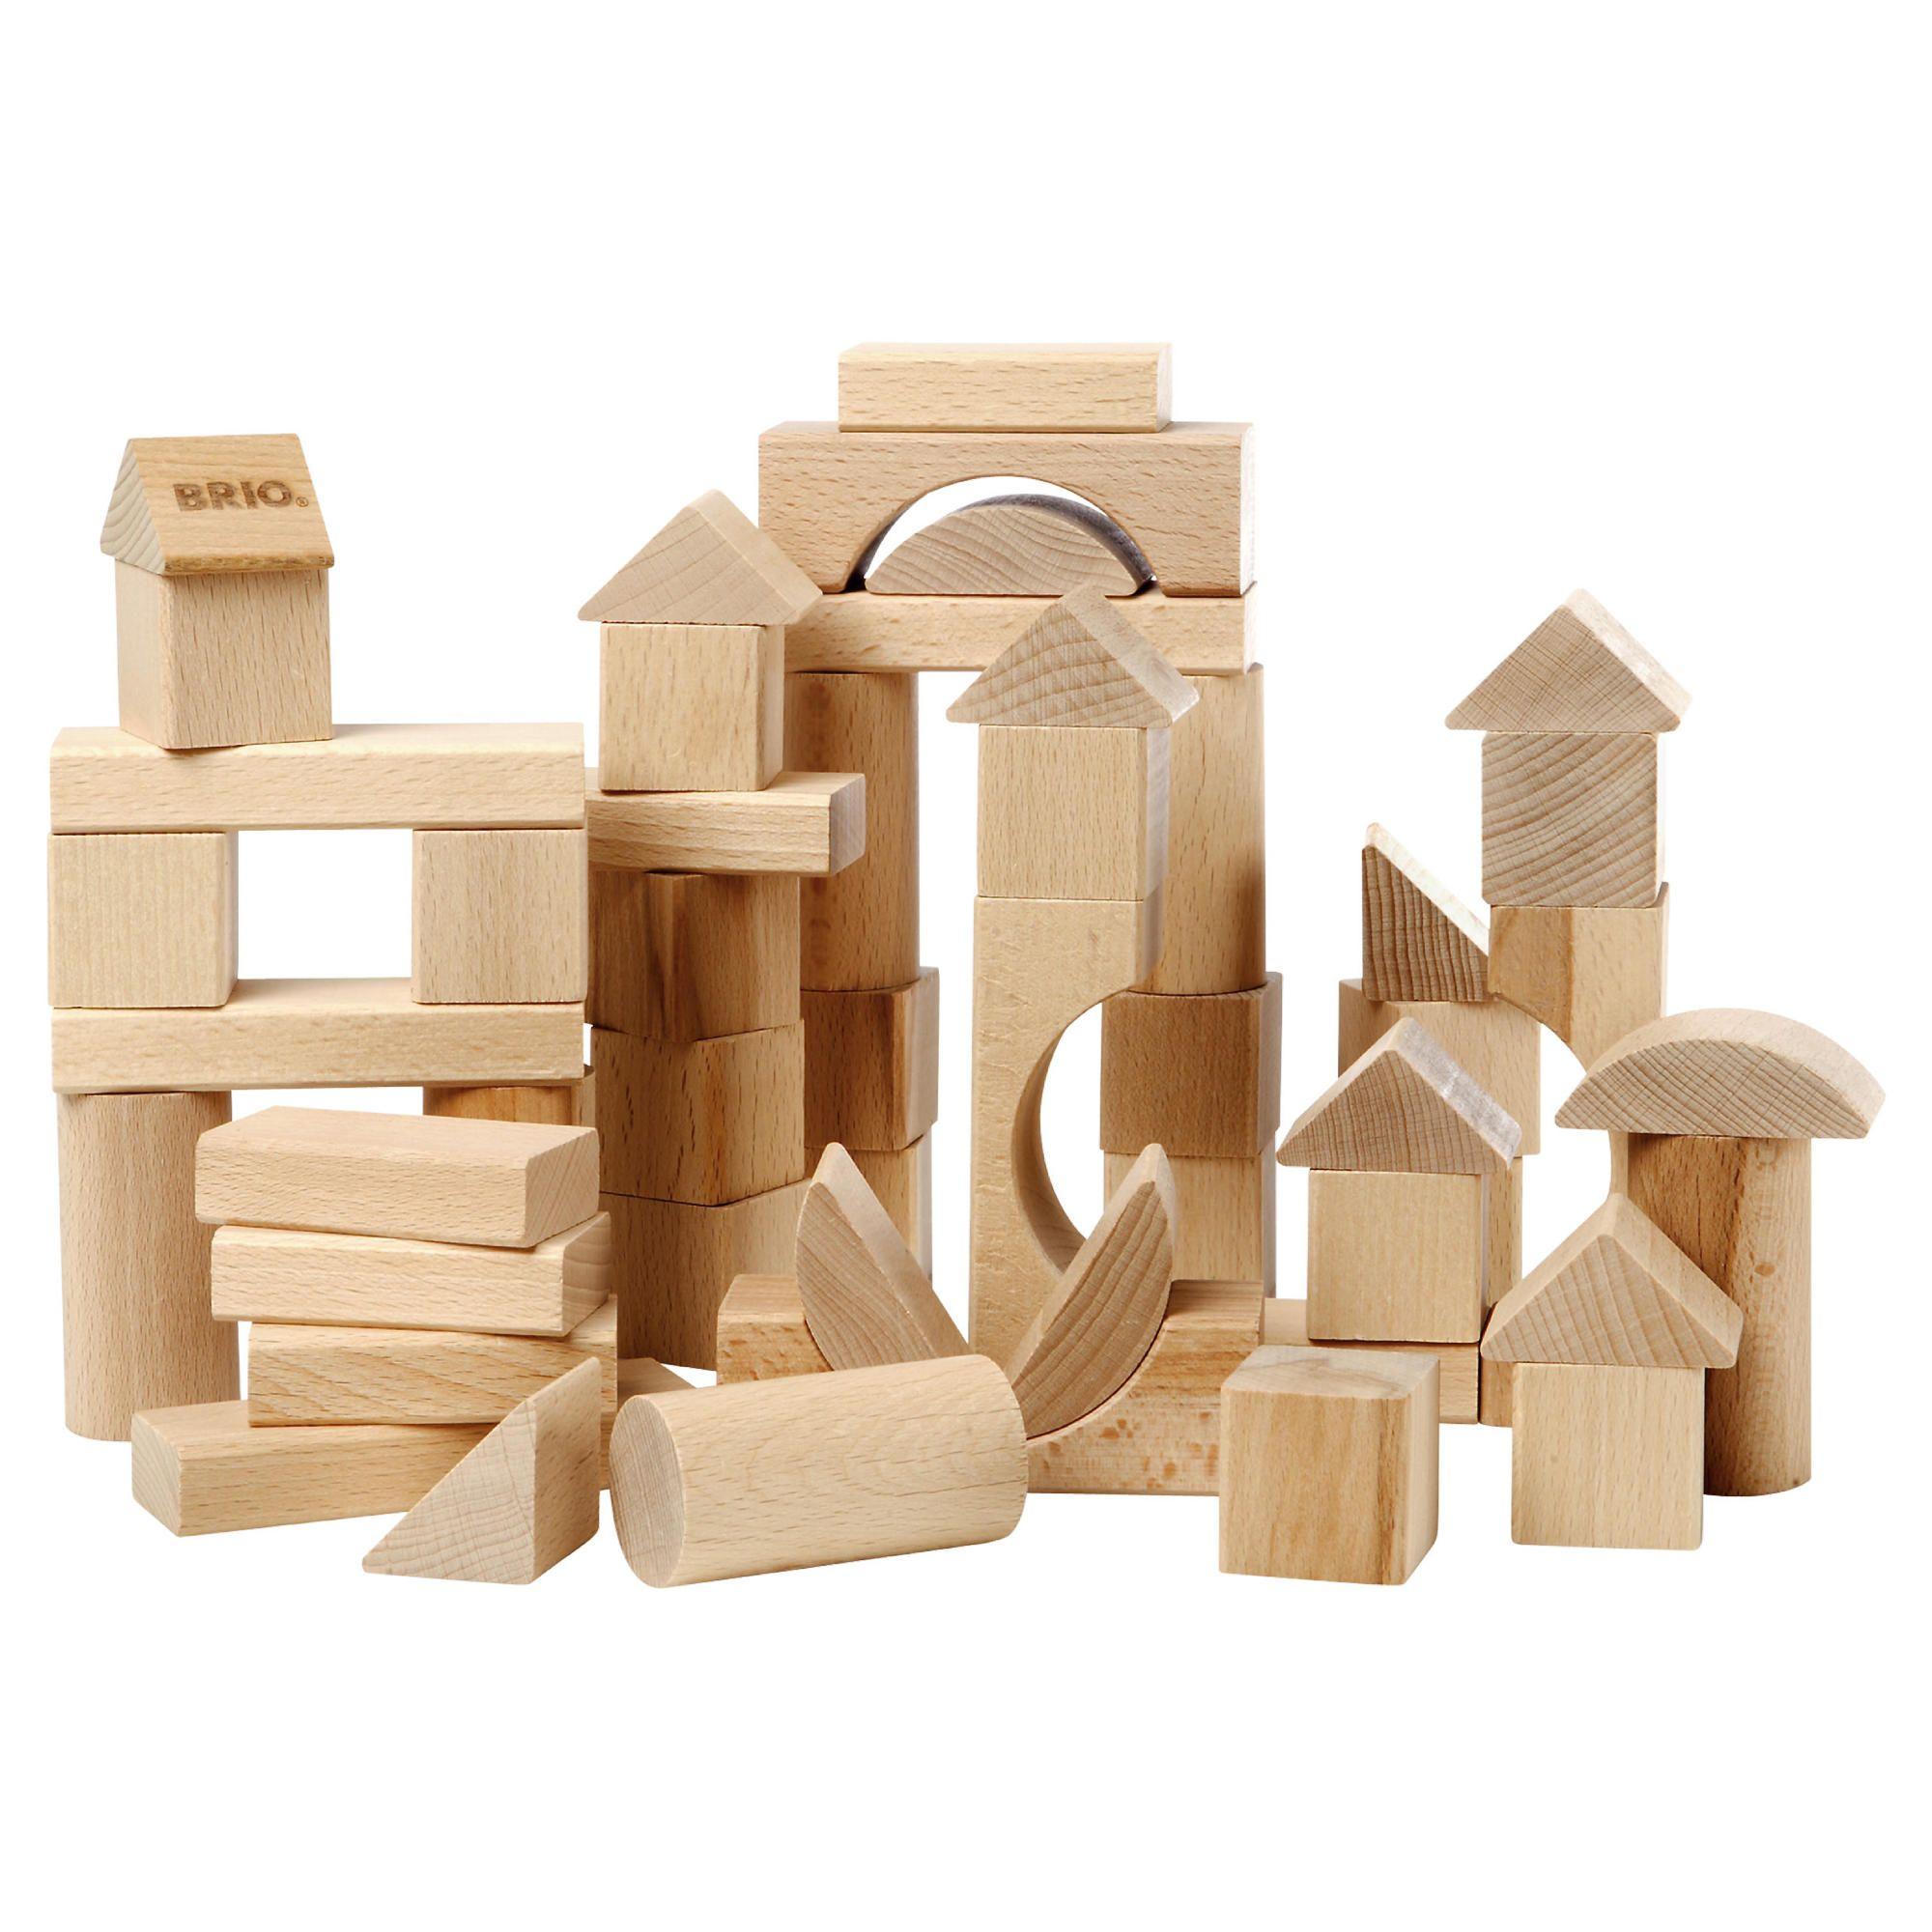 Depols plan toys wooden blocks